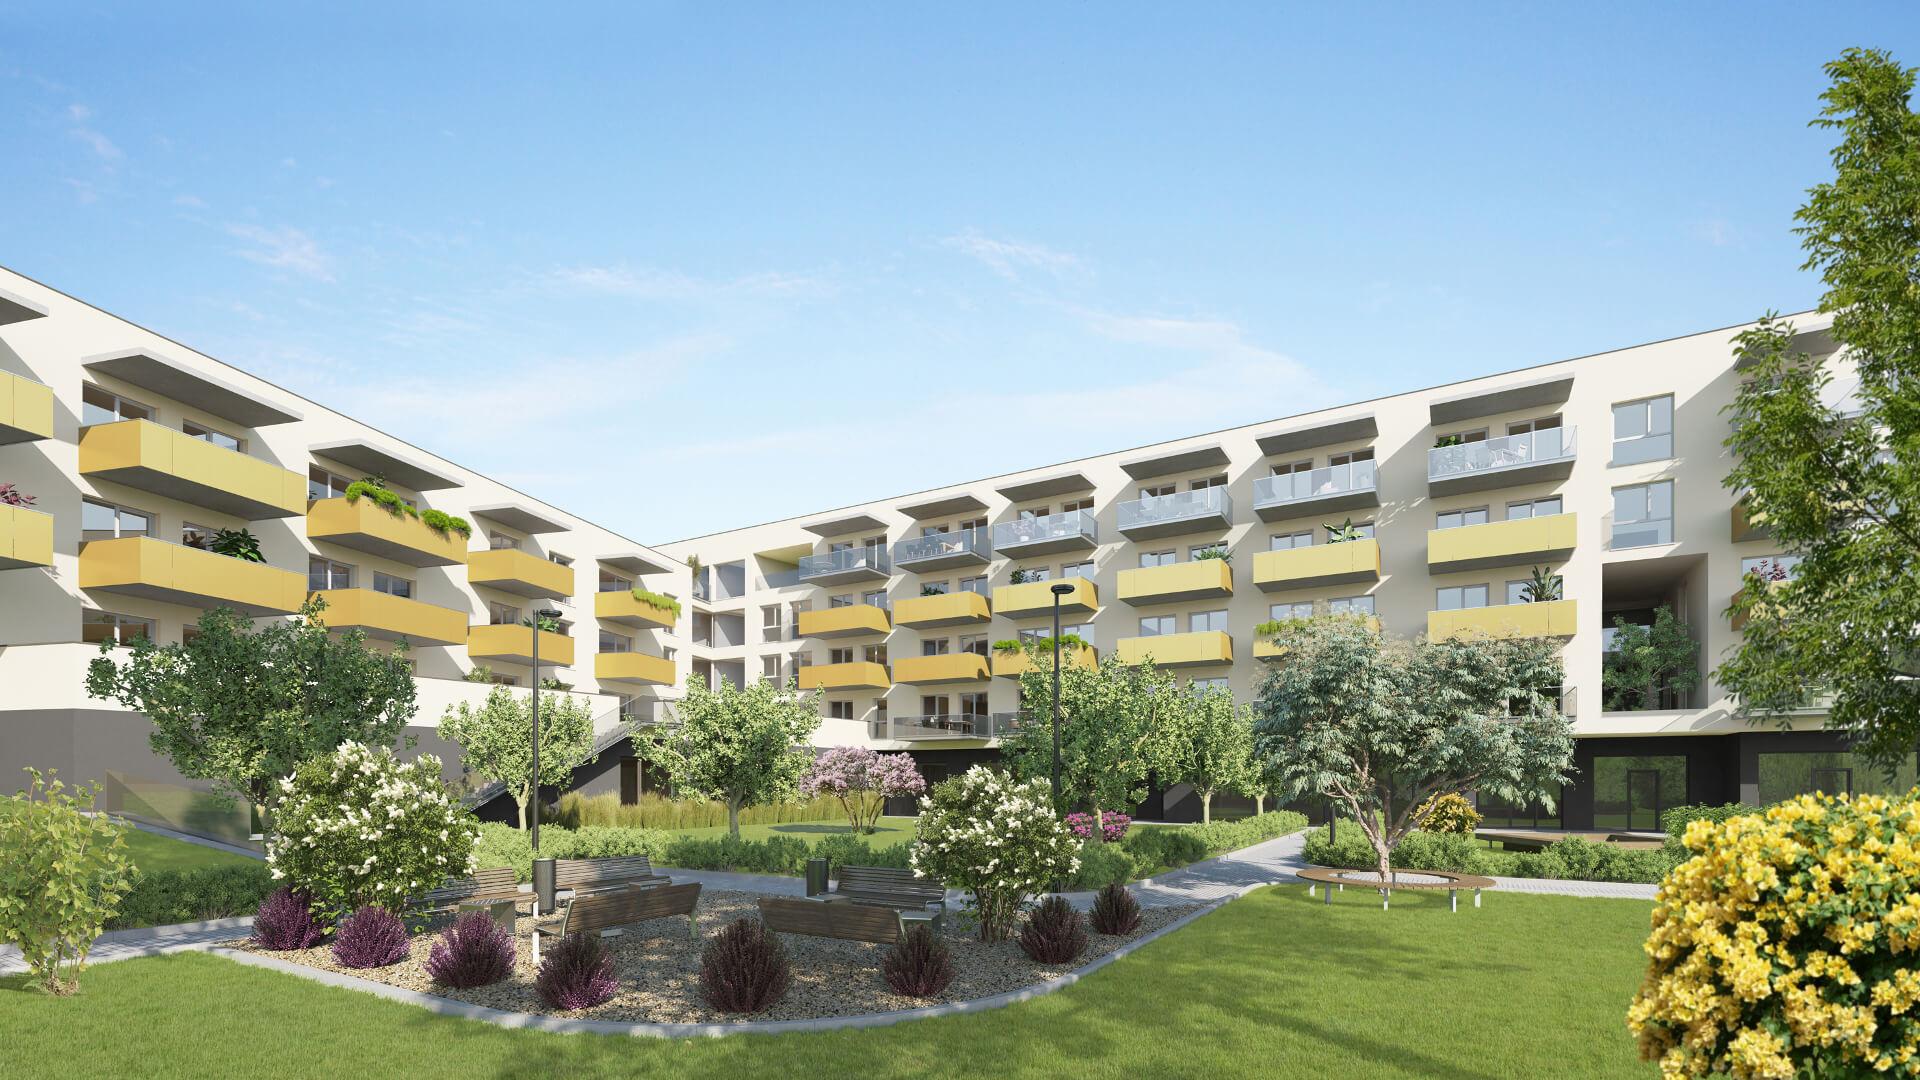 Neubauherrenmodell - 8020 Graz, Köstenbaumgasse 1 - Gartenansicht